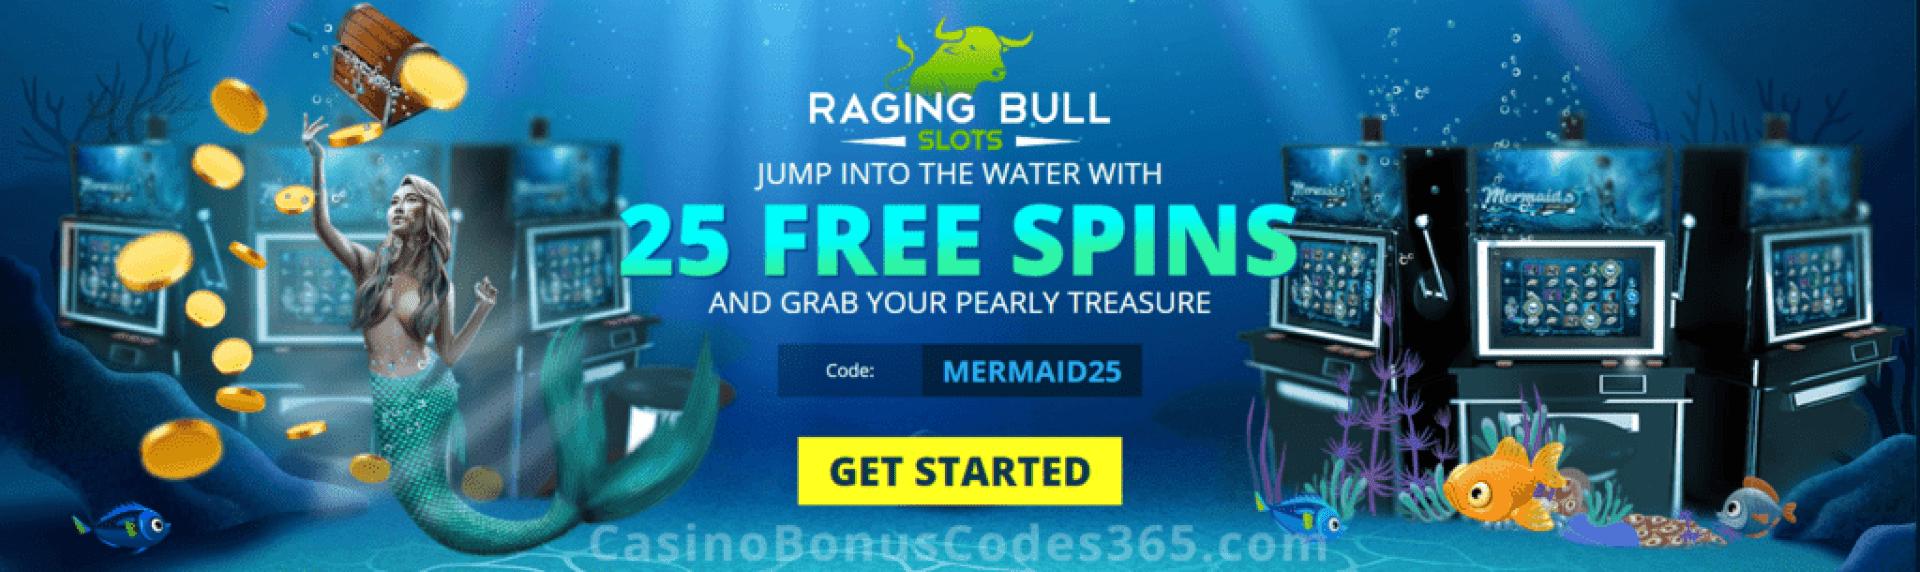 Raging Bull Casino 25 FREE RTG Mermaid's Pearls Spins